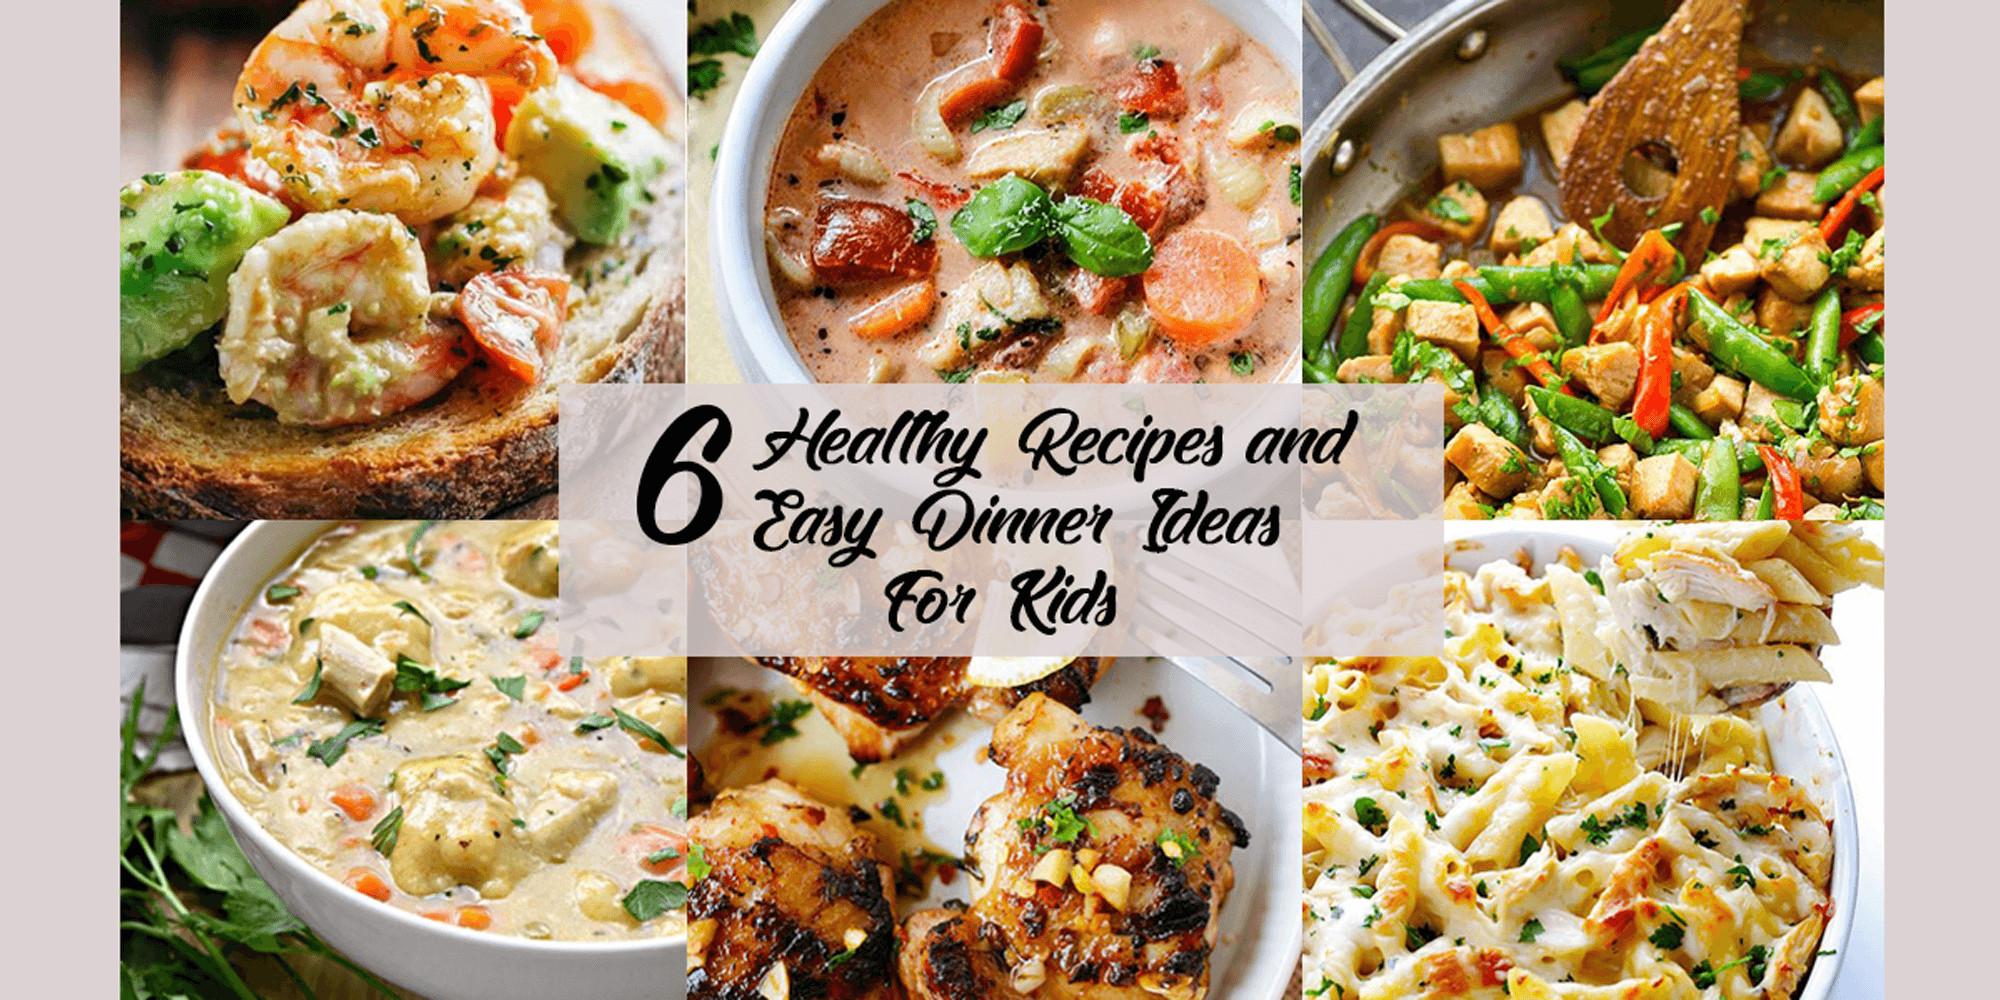 Kids Dinner Ideas  6 Healthy and Easy Dinner Ideas for Kids